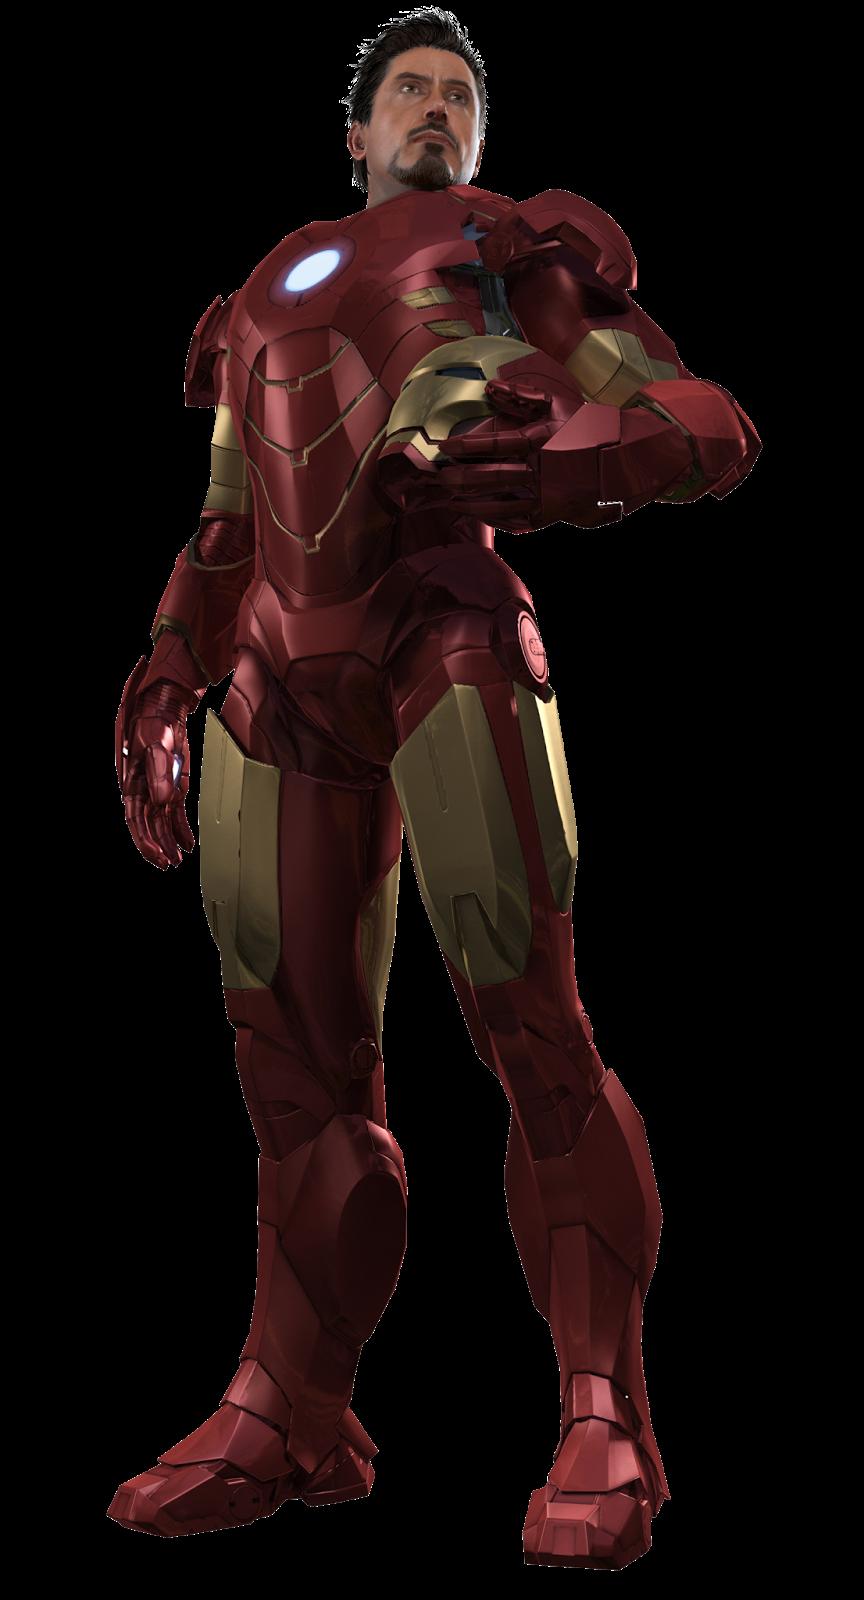 Iron Man 2: My Heroe Comic: IRON MAN